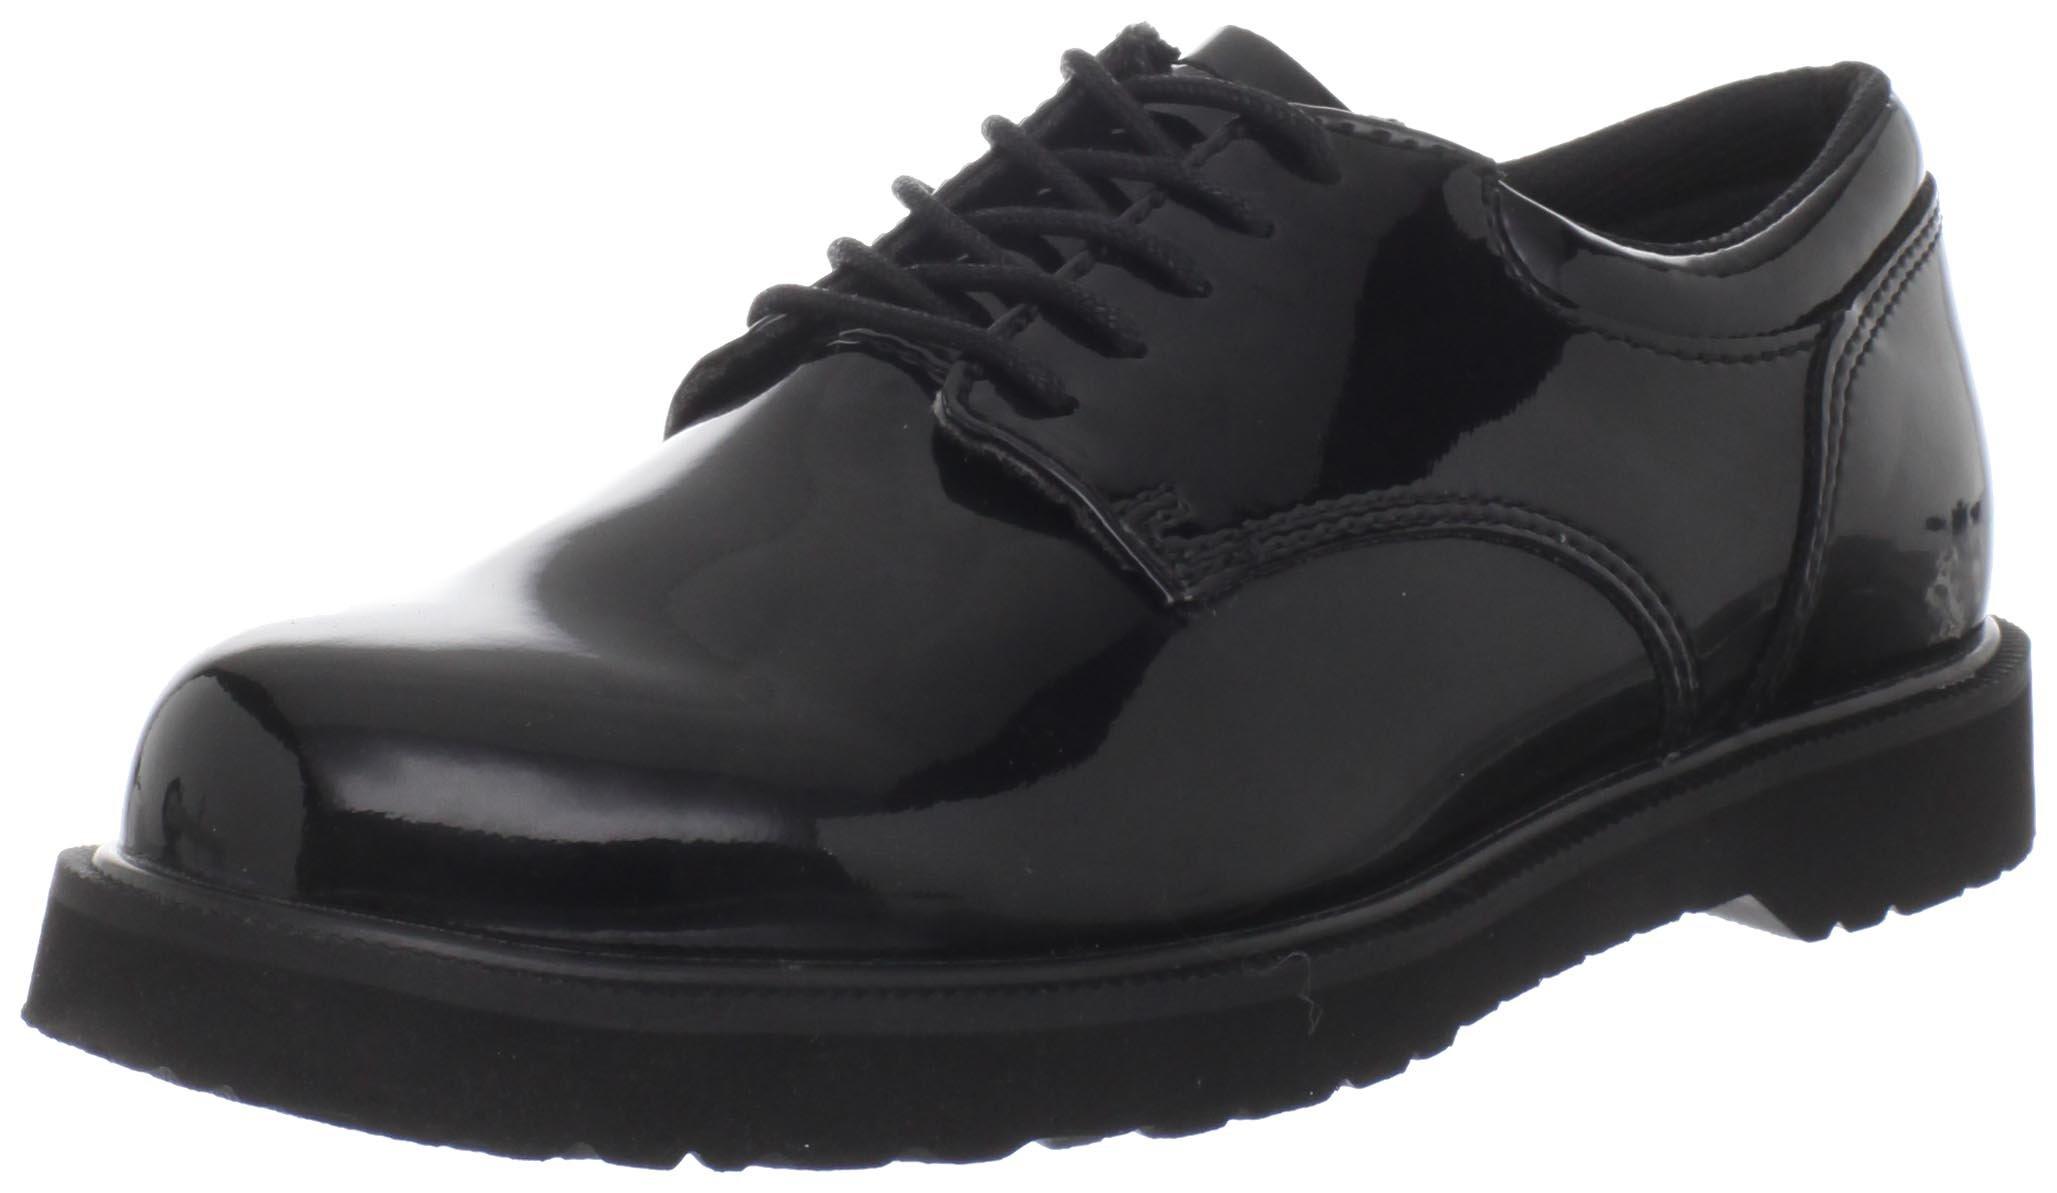 Bates Women's Uniform High Gloss Boot, Black, 8 W US